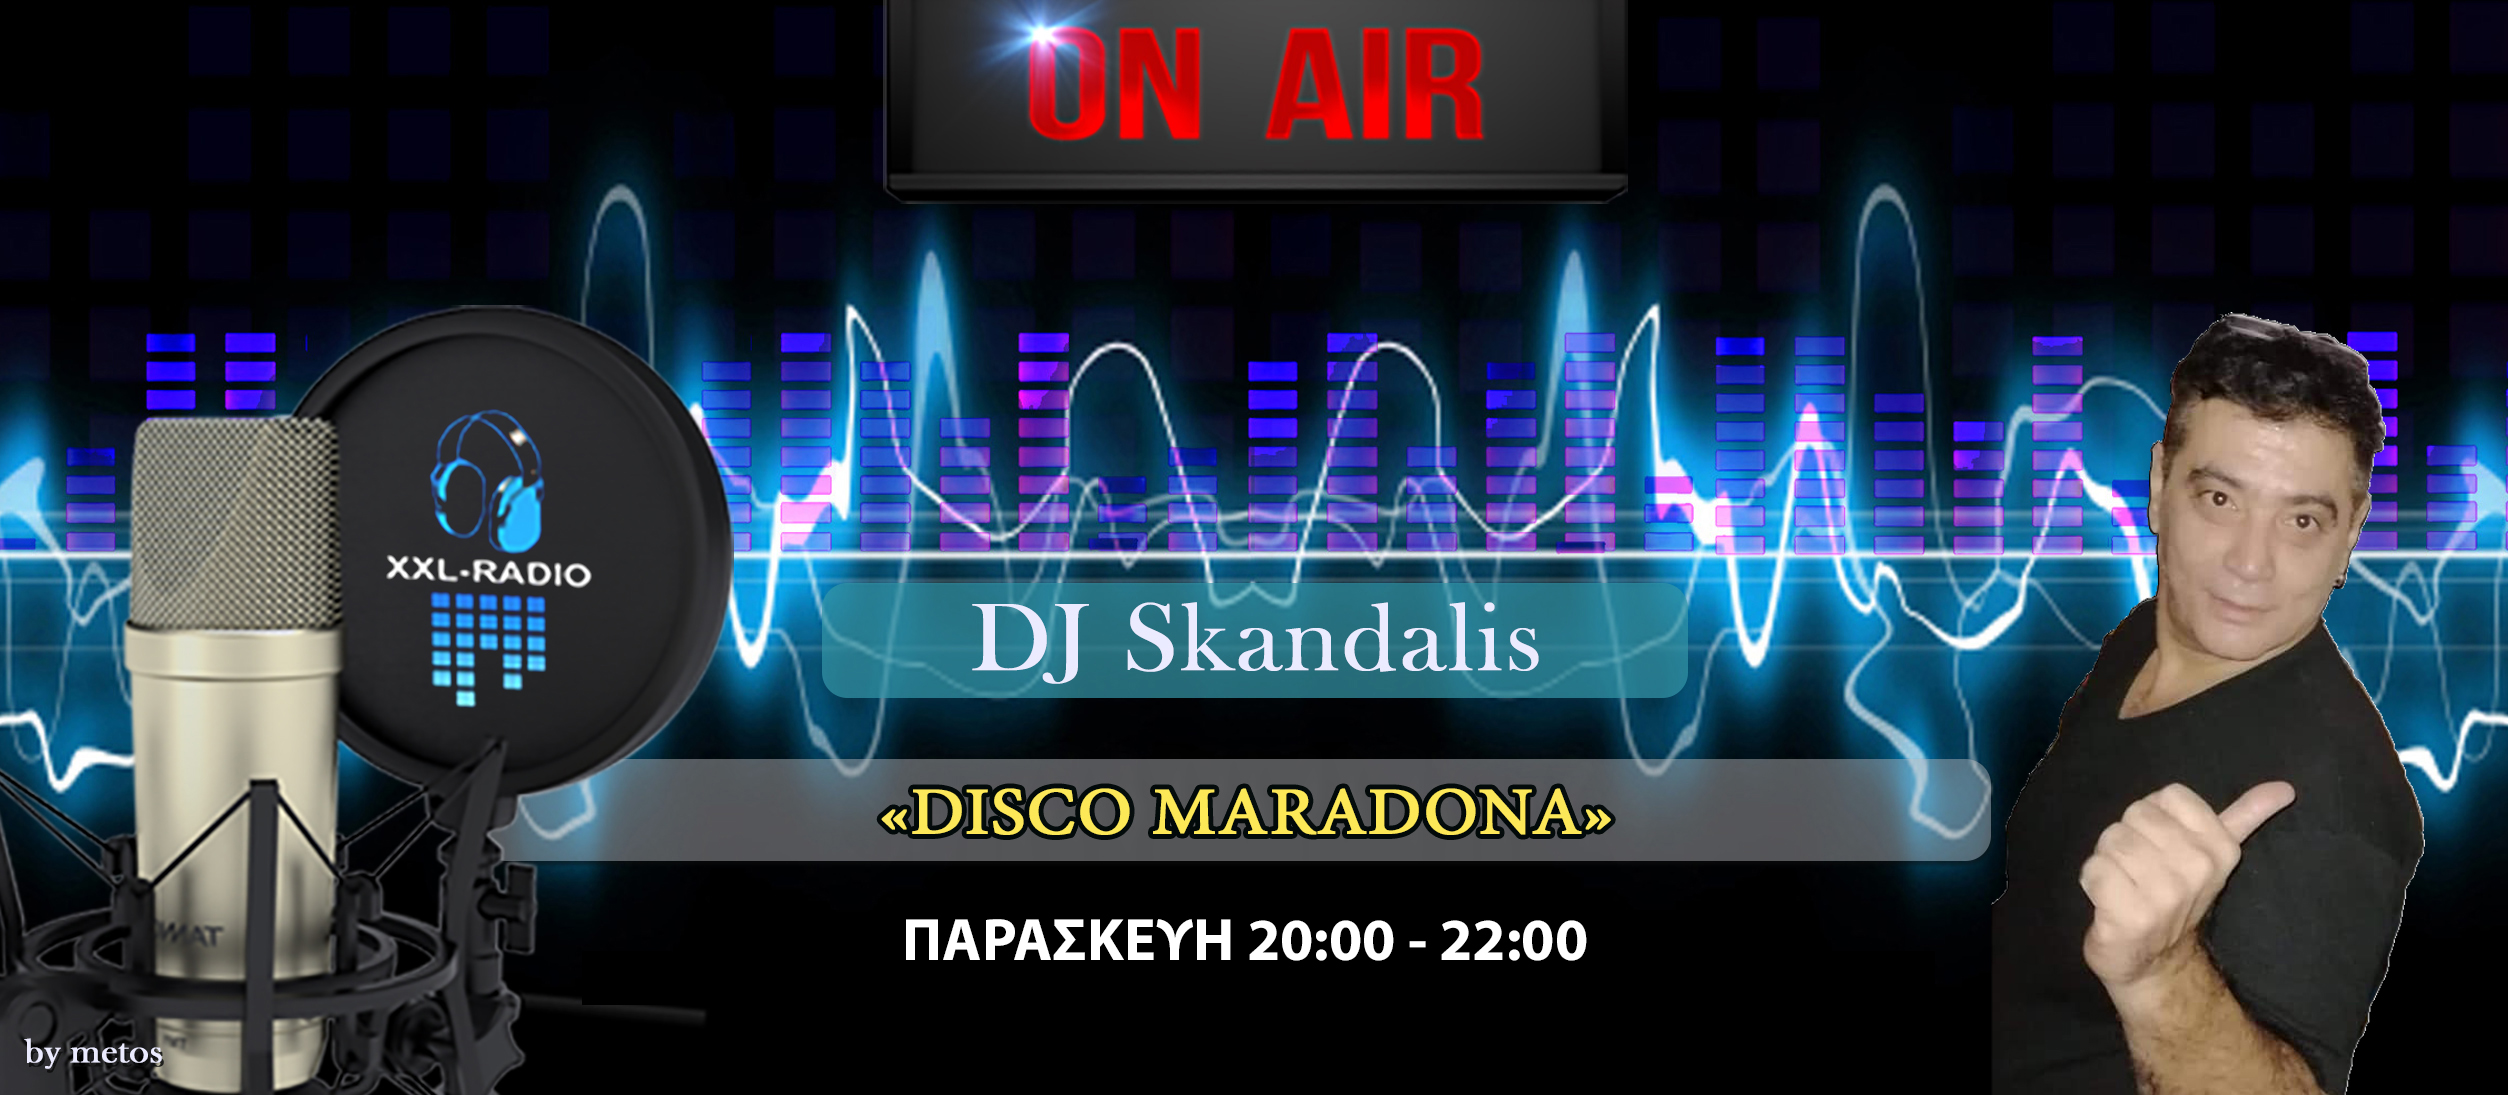 DJ SKANDALIS